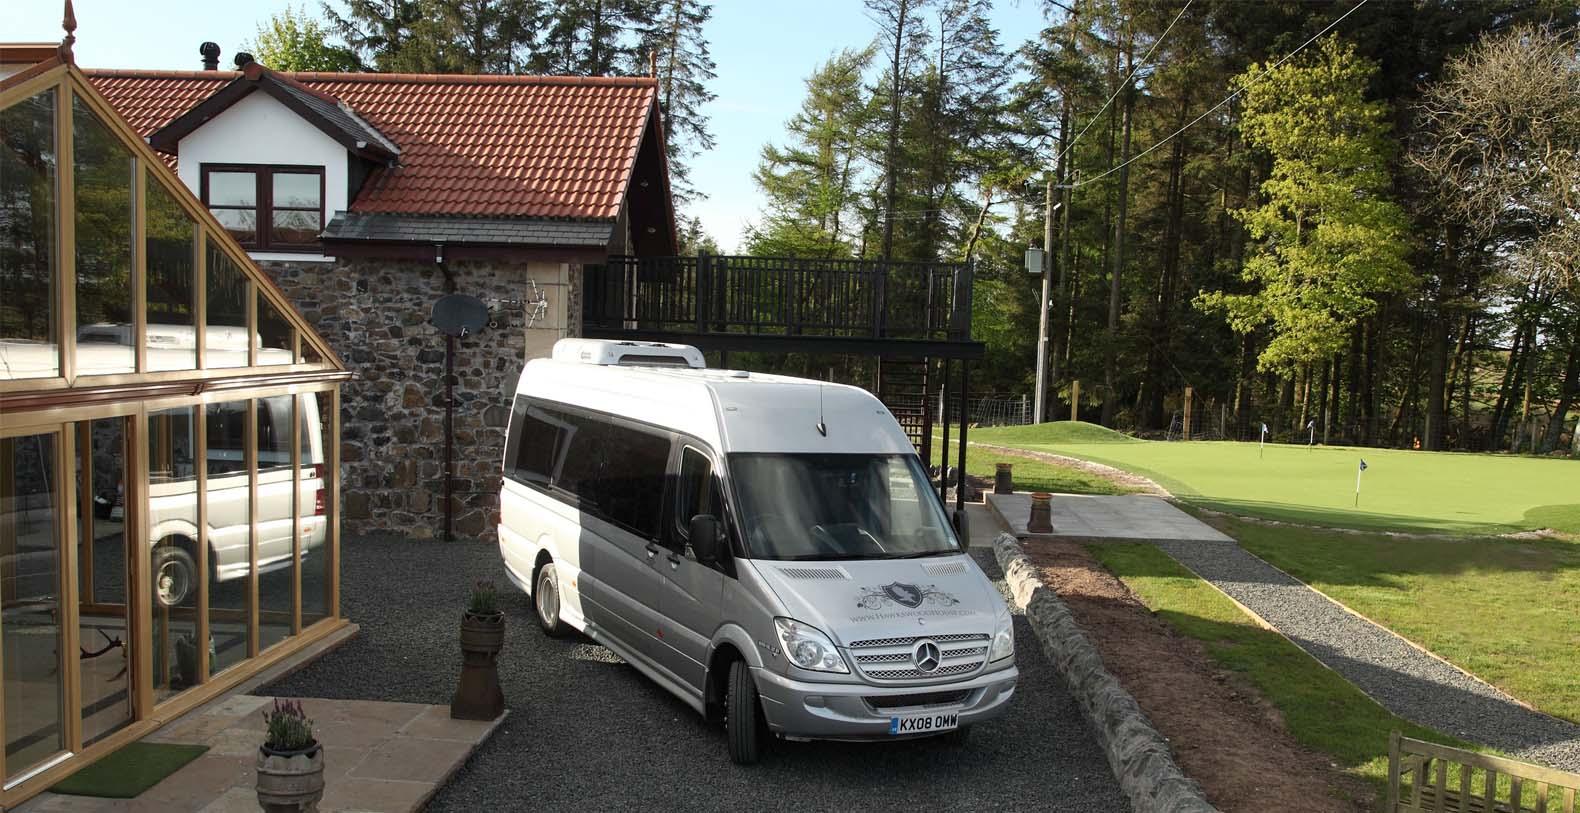 Hawkswood House Kingdom of Fife, Scotland, Vacation Rentals